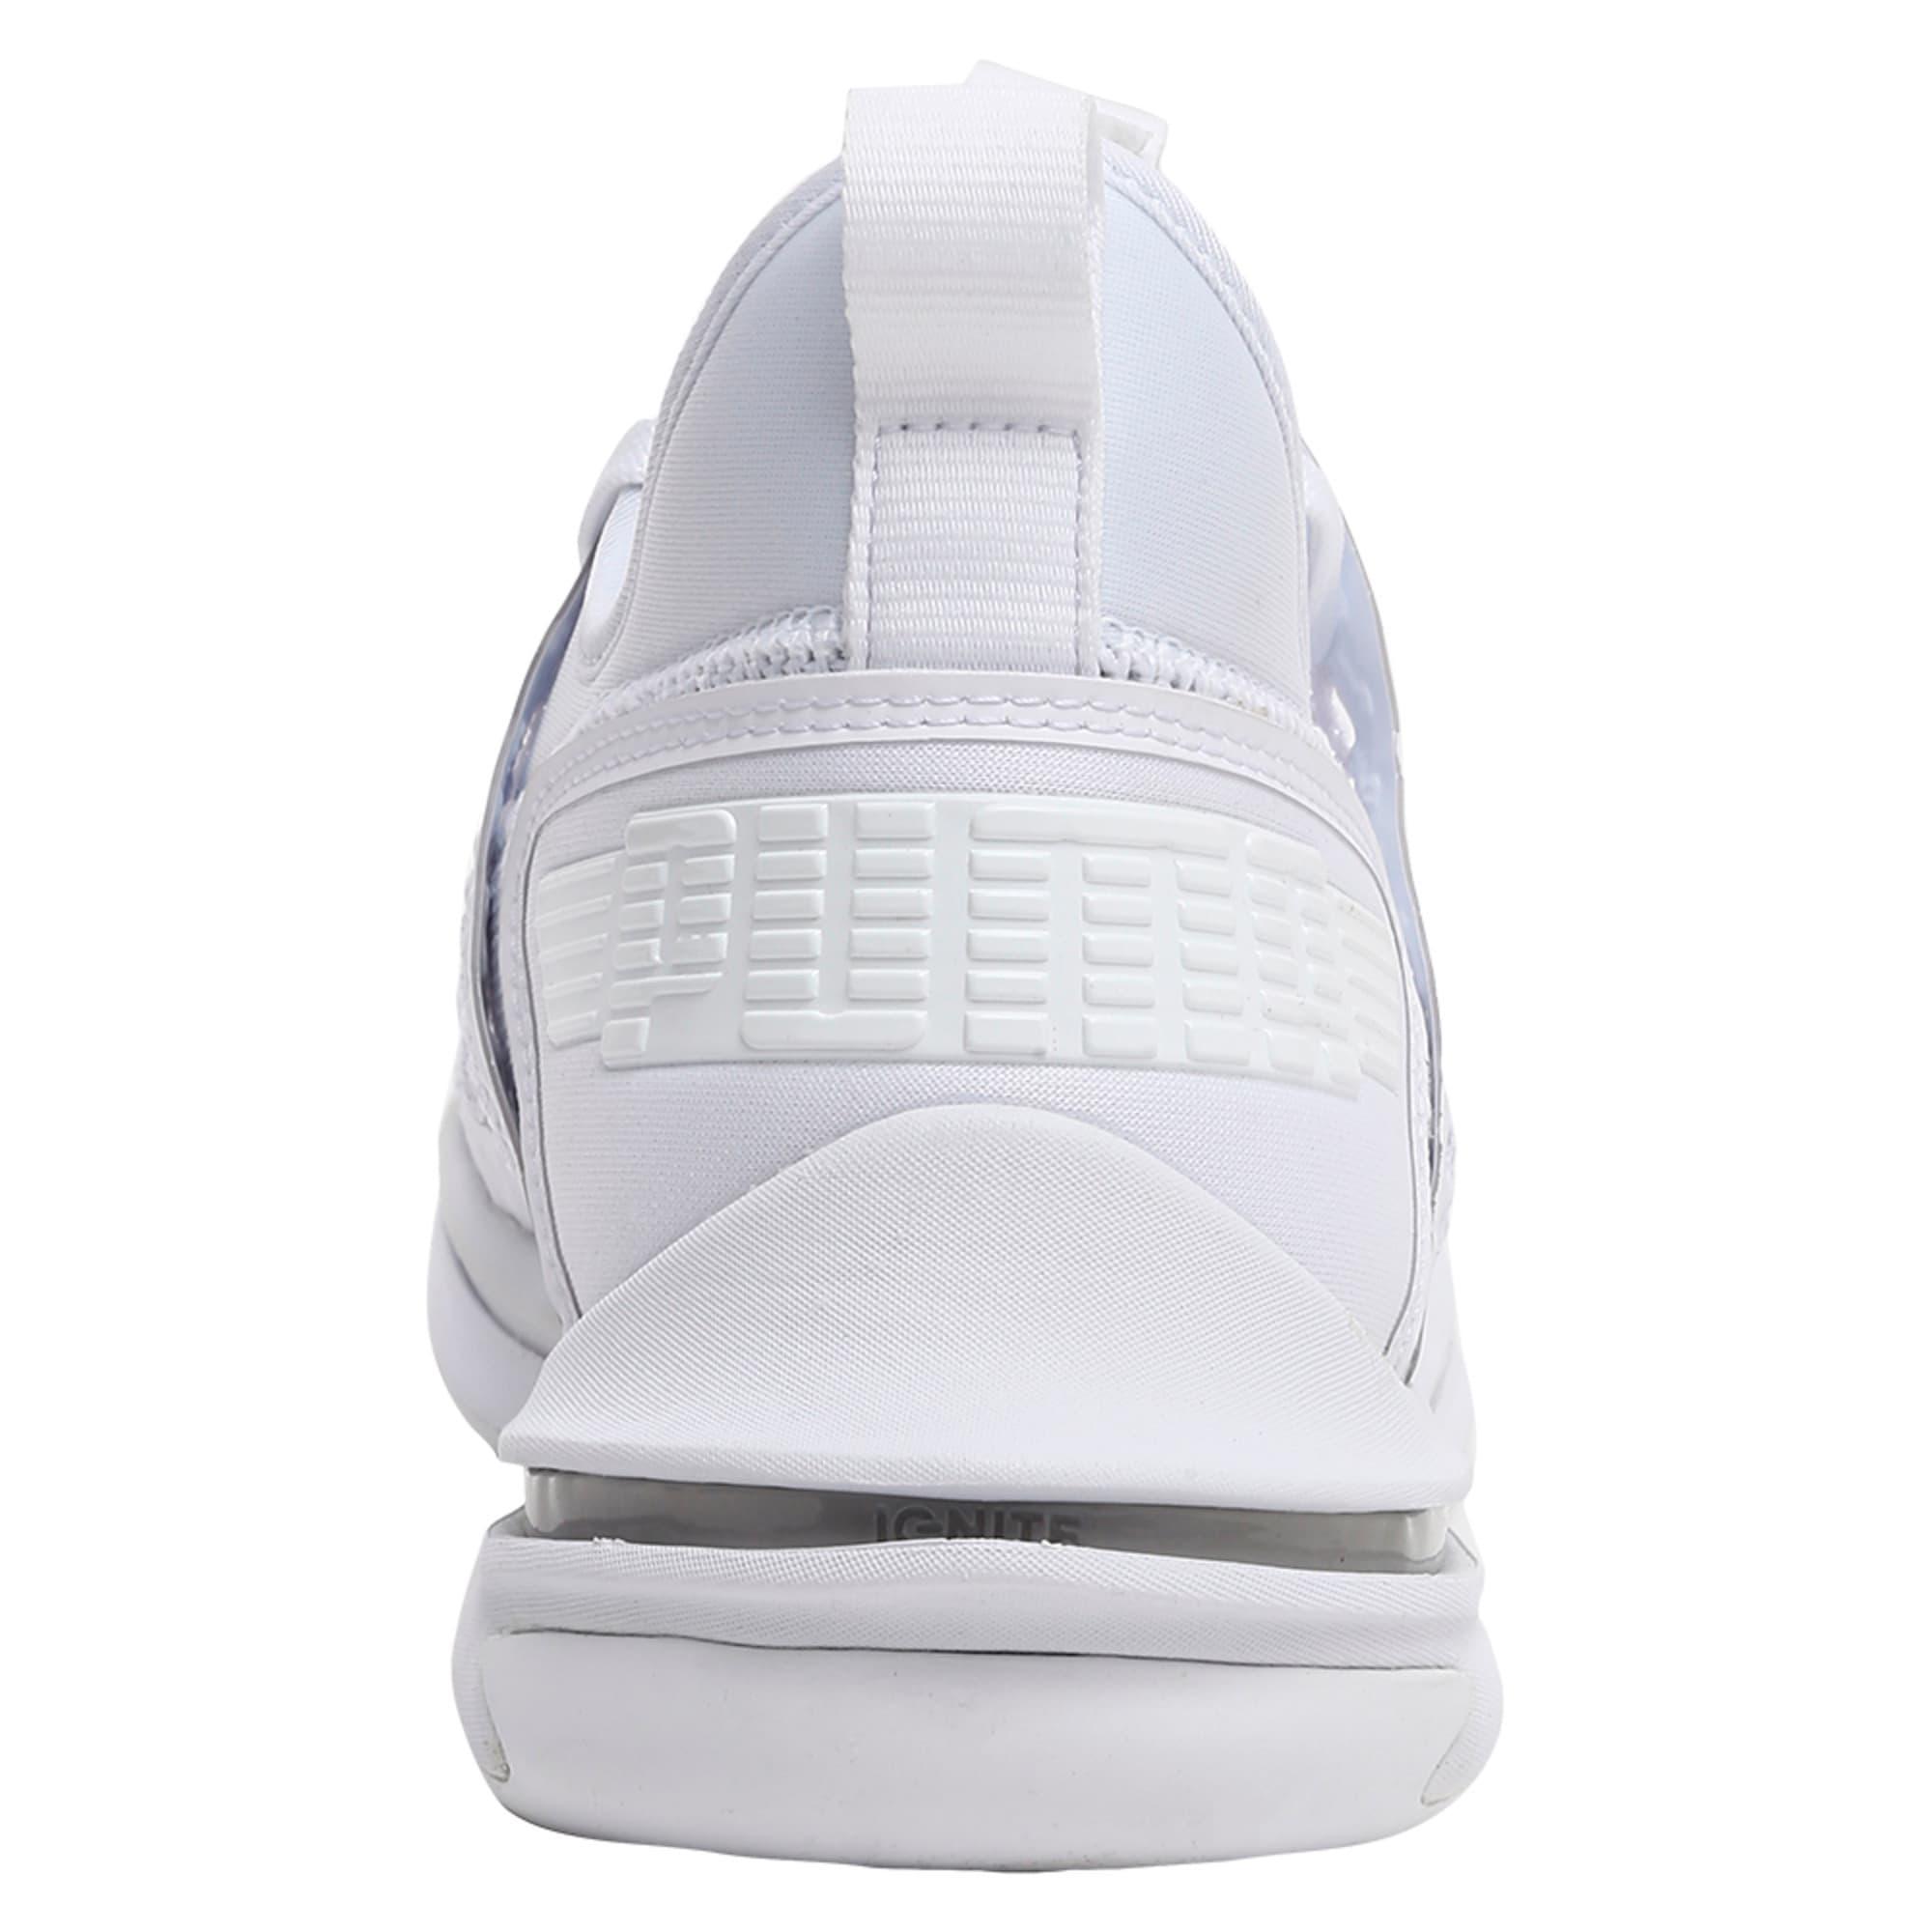 Thumbnail 6 of IGNITE Limitless SR NETFIT Men's Trainer Shoes, Puma White-Puma White, medium-IND